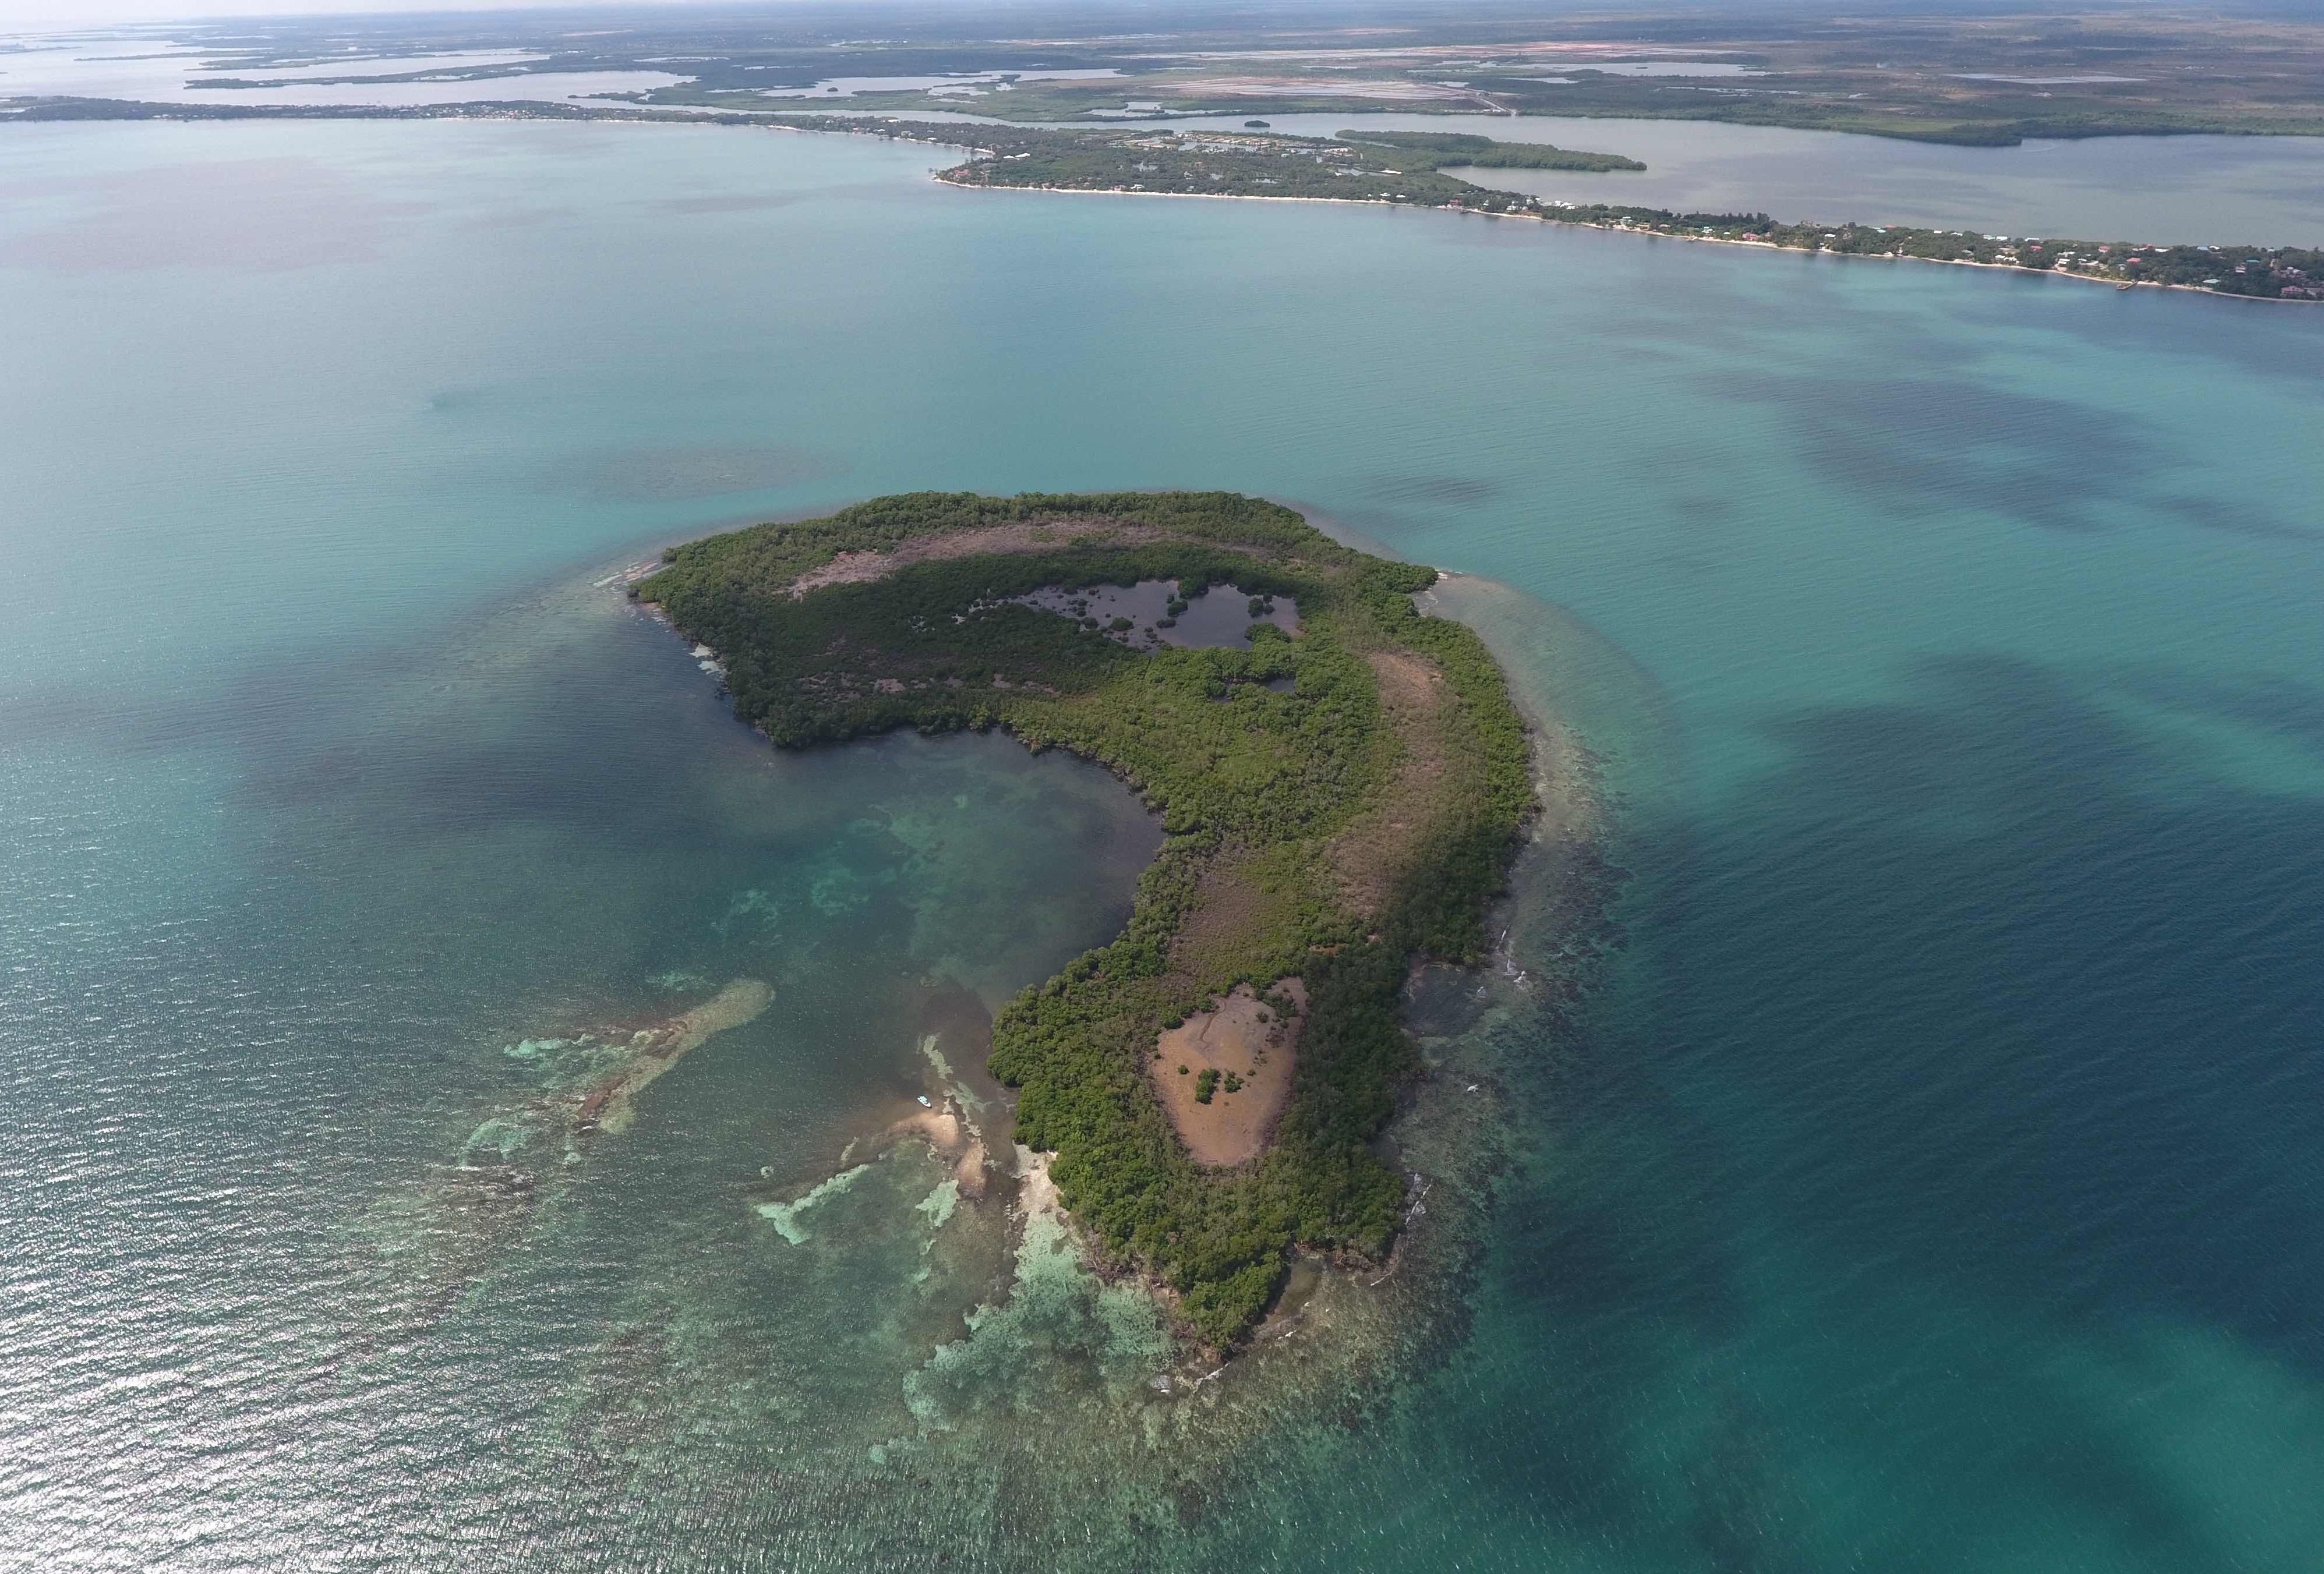 False Caye - Belize, Central America - Private Islands for